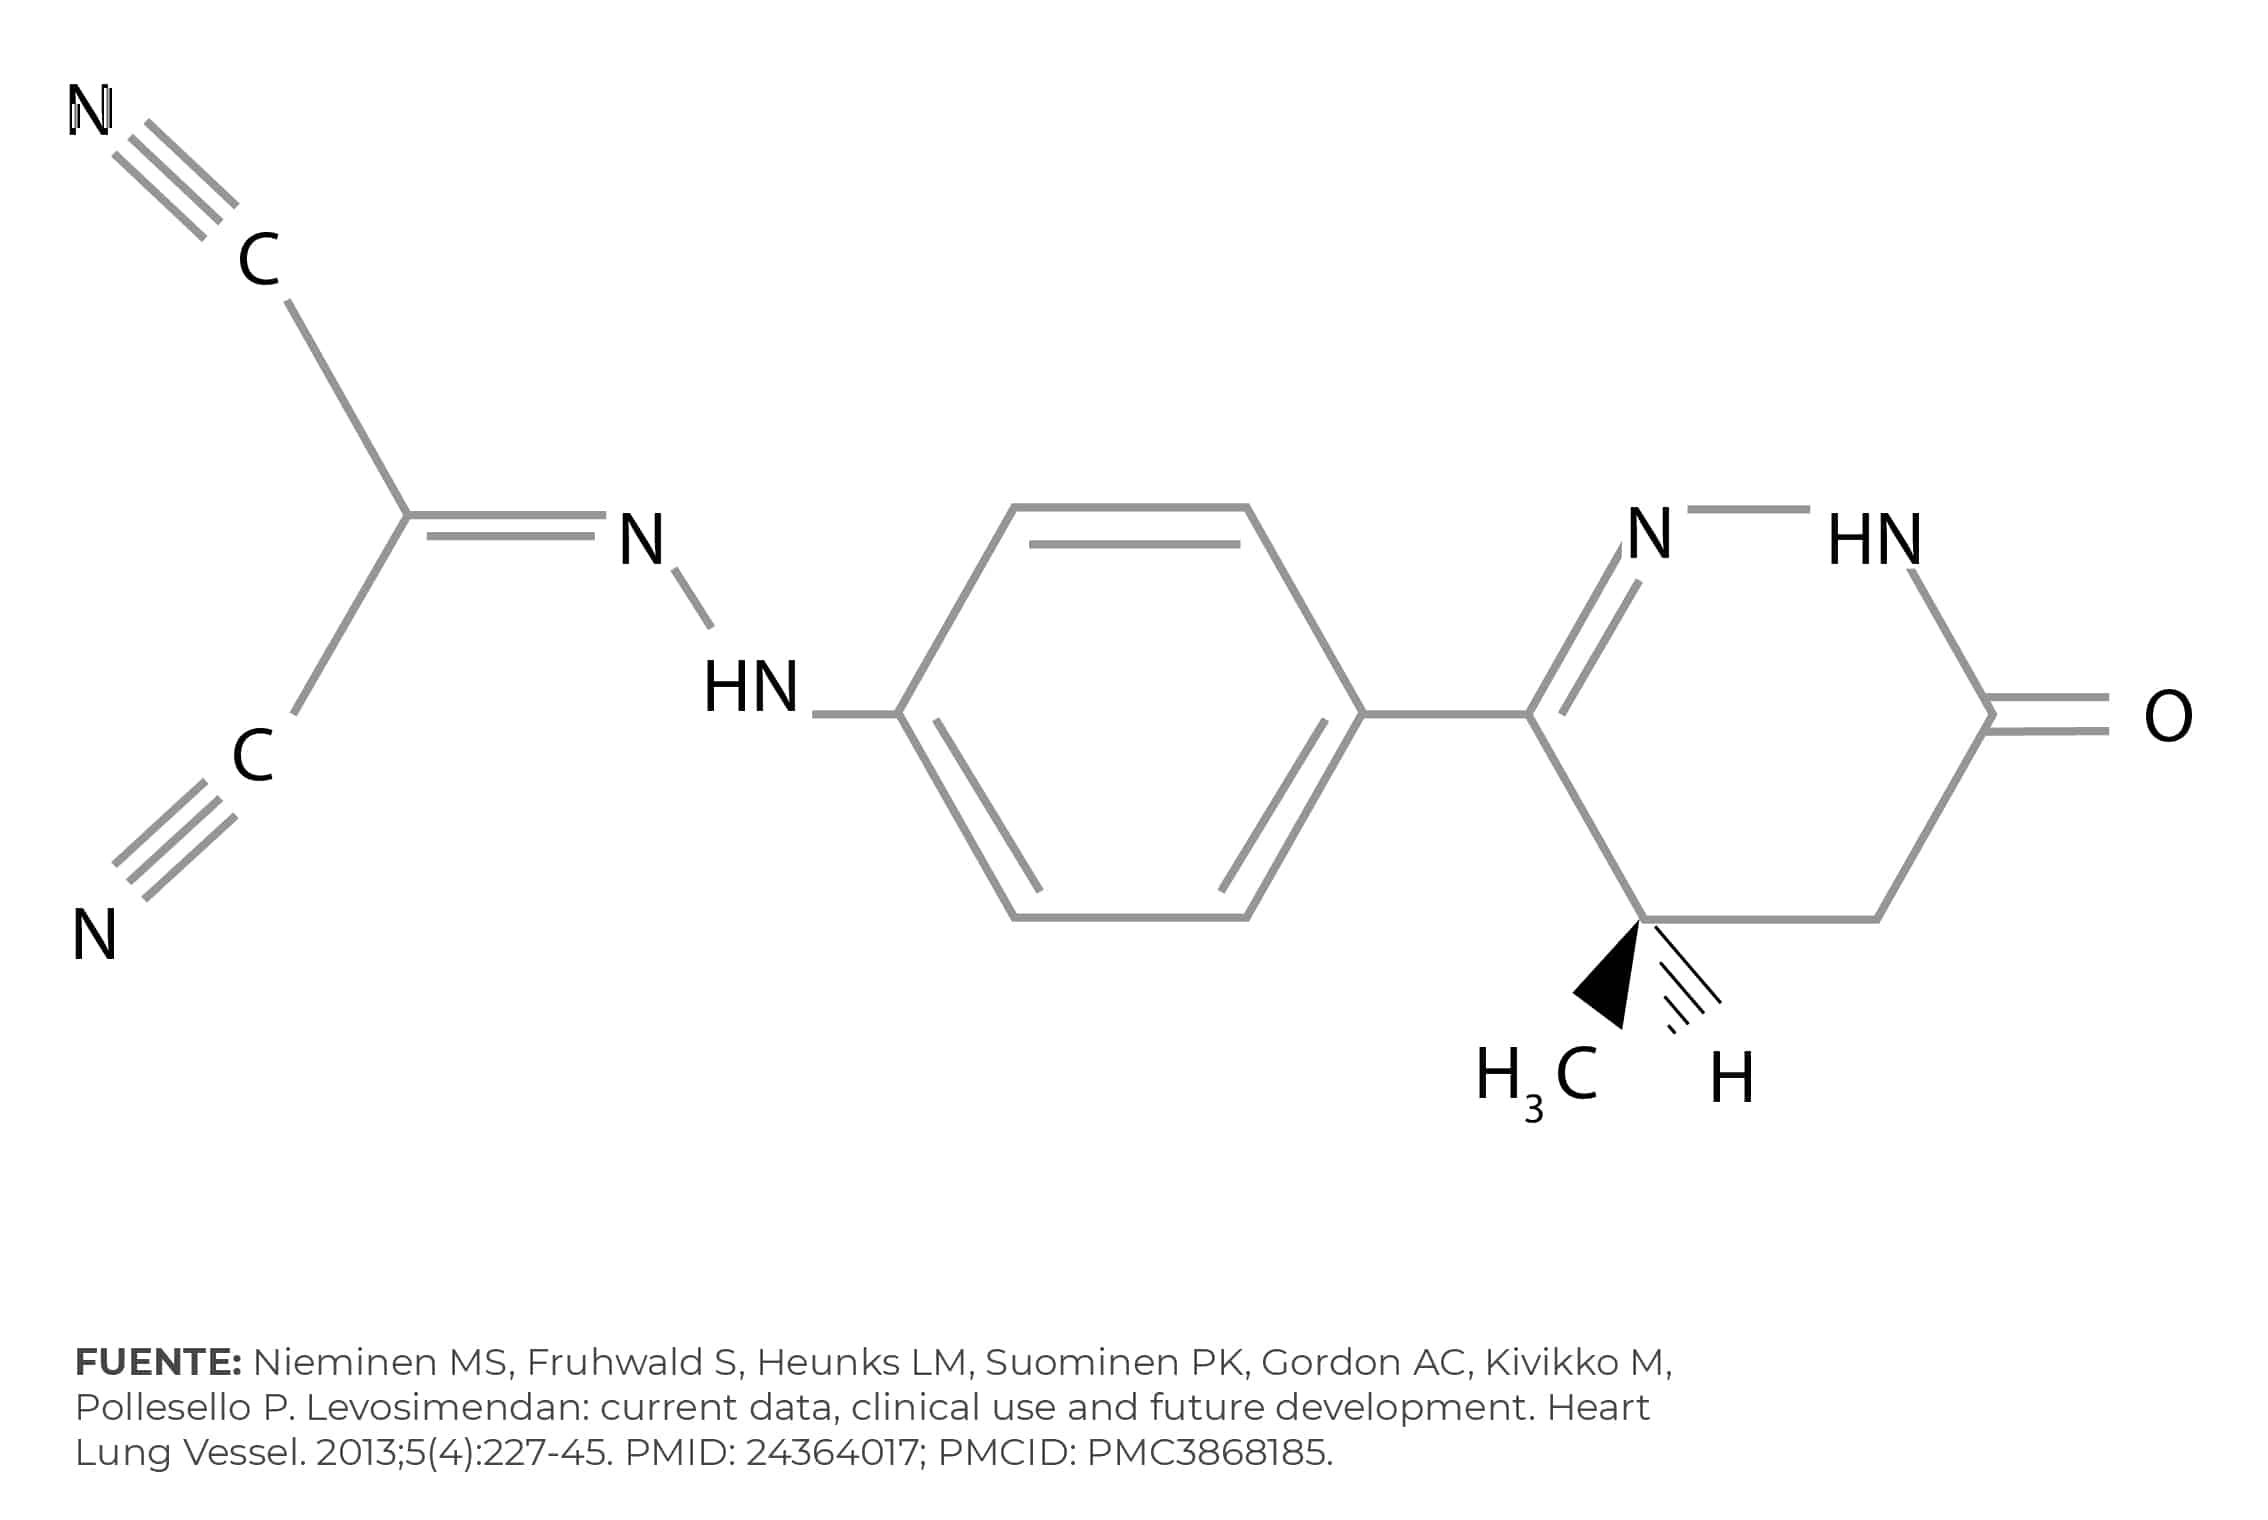 Figura 2: Molécula de Levosimendán [14].